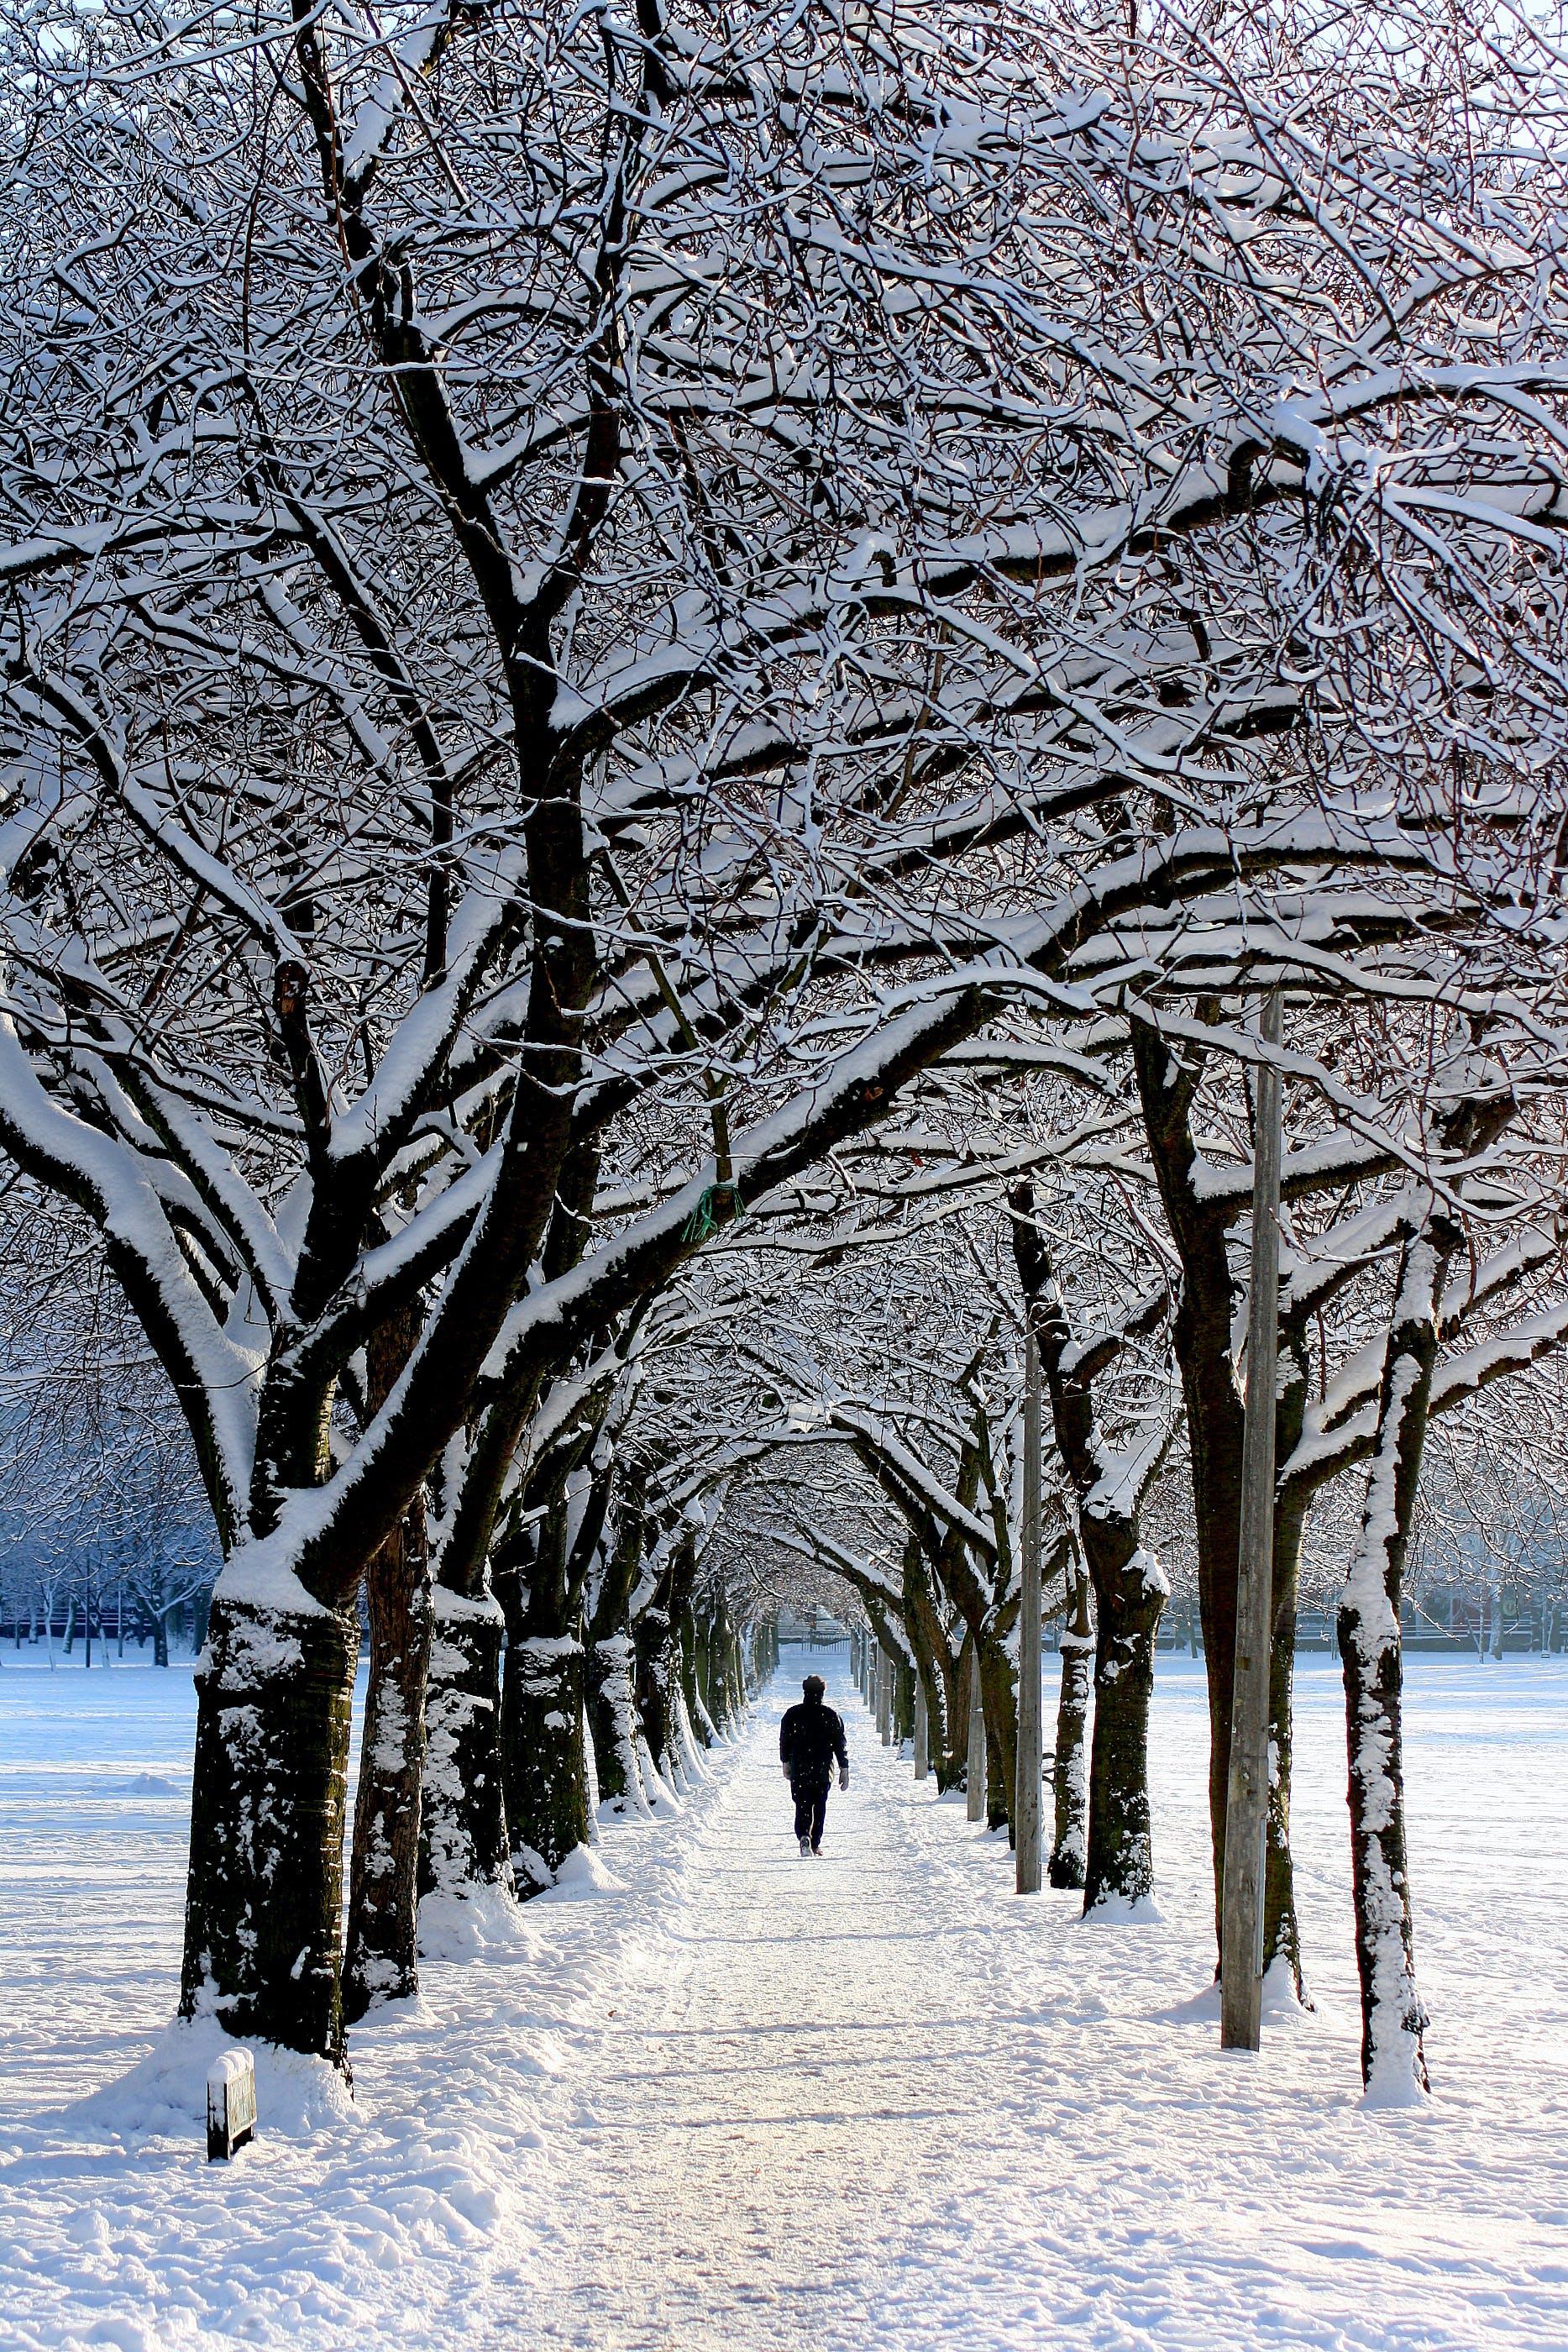 Man in Black Jacket Walking on Snowy Tree during Daytime